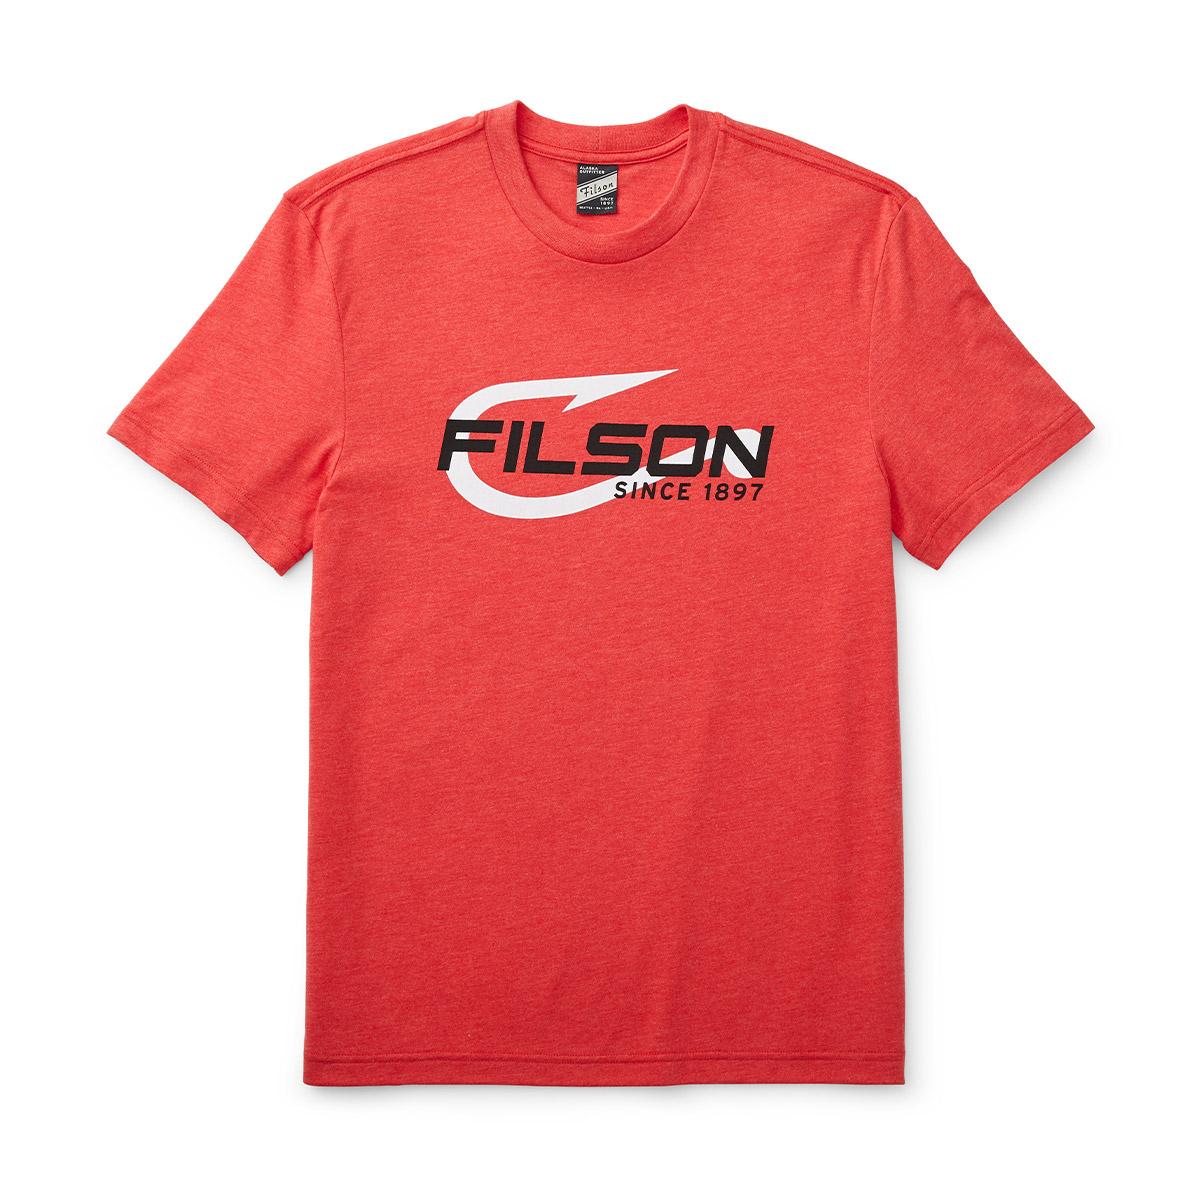 Filson Buckshot T-Shirt Mackinaw Red, high performance T-shirt with UPF 50+ sun protection